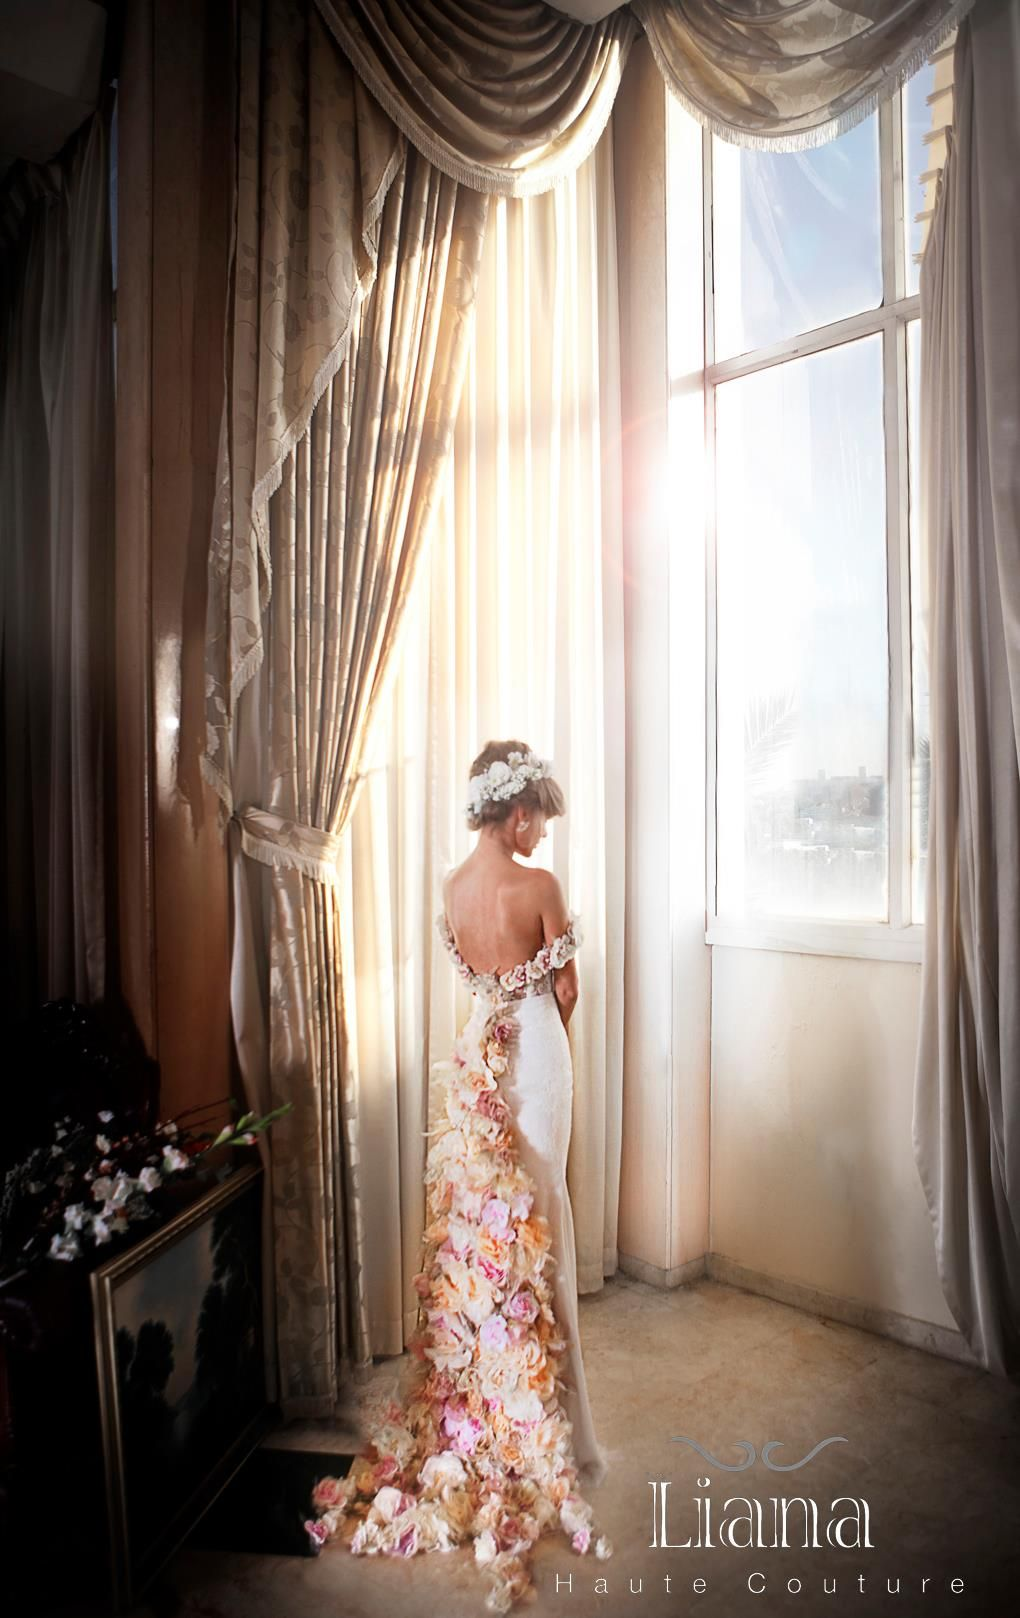 2014 haute couture bridal gowns liana haute couture 2013 2014 bridal collection bellanaija. Black Bedroom Furniture Sets. Home Design Ideas